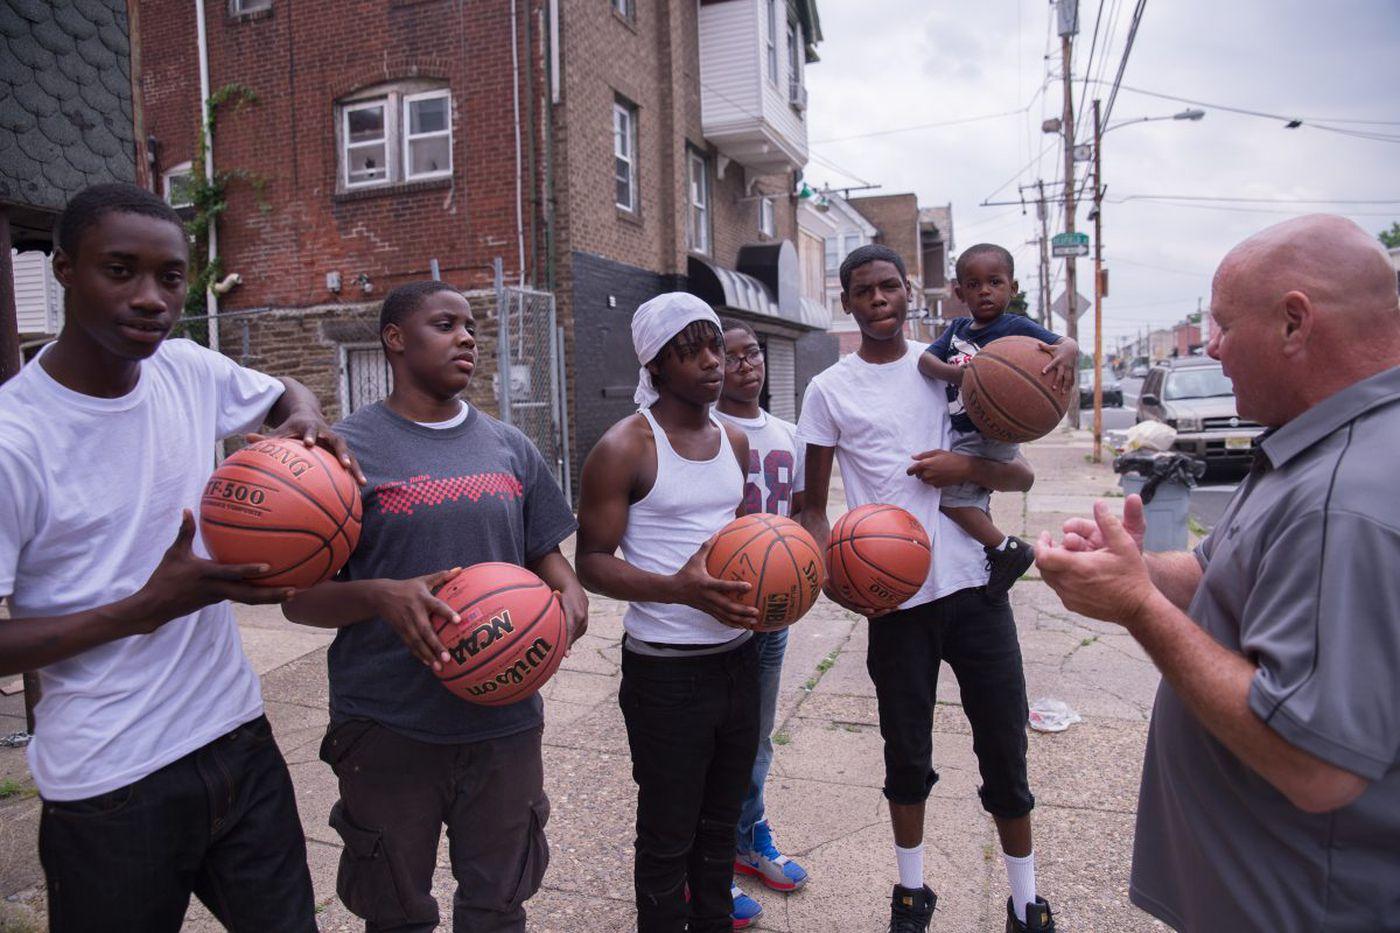 Random acts of basketball kindness in Philadelphia   Mike Jensen